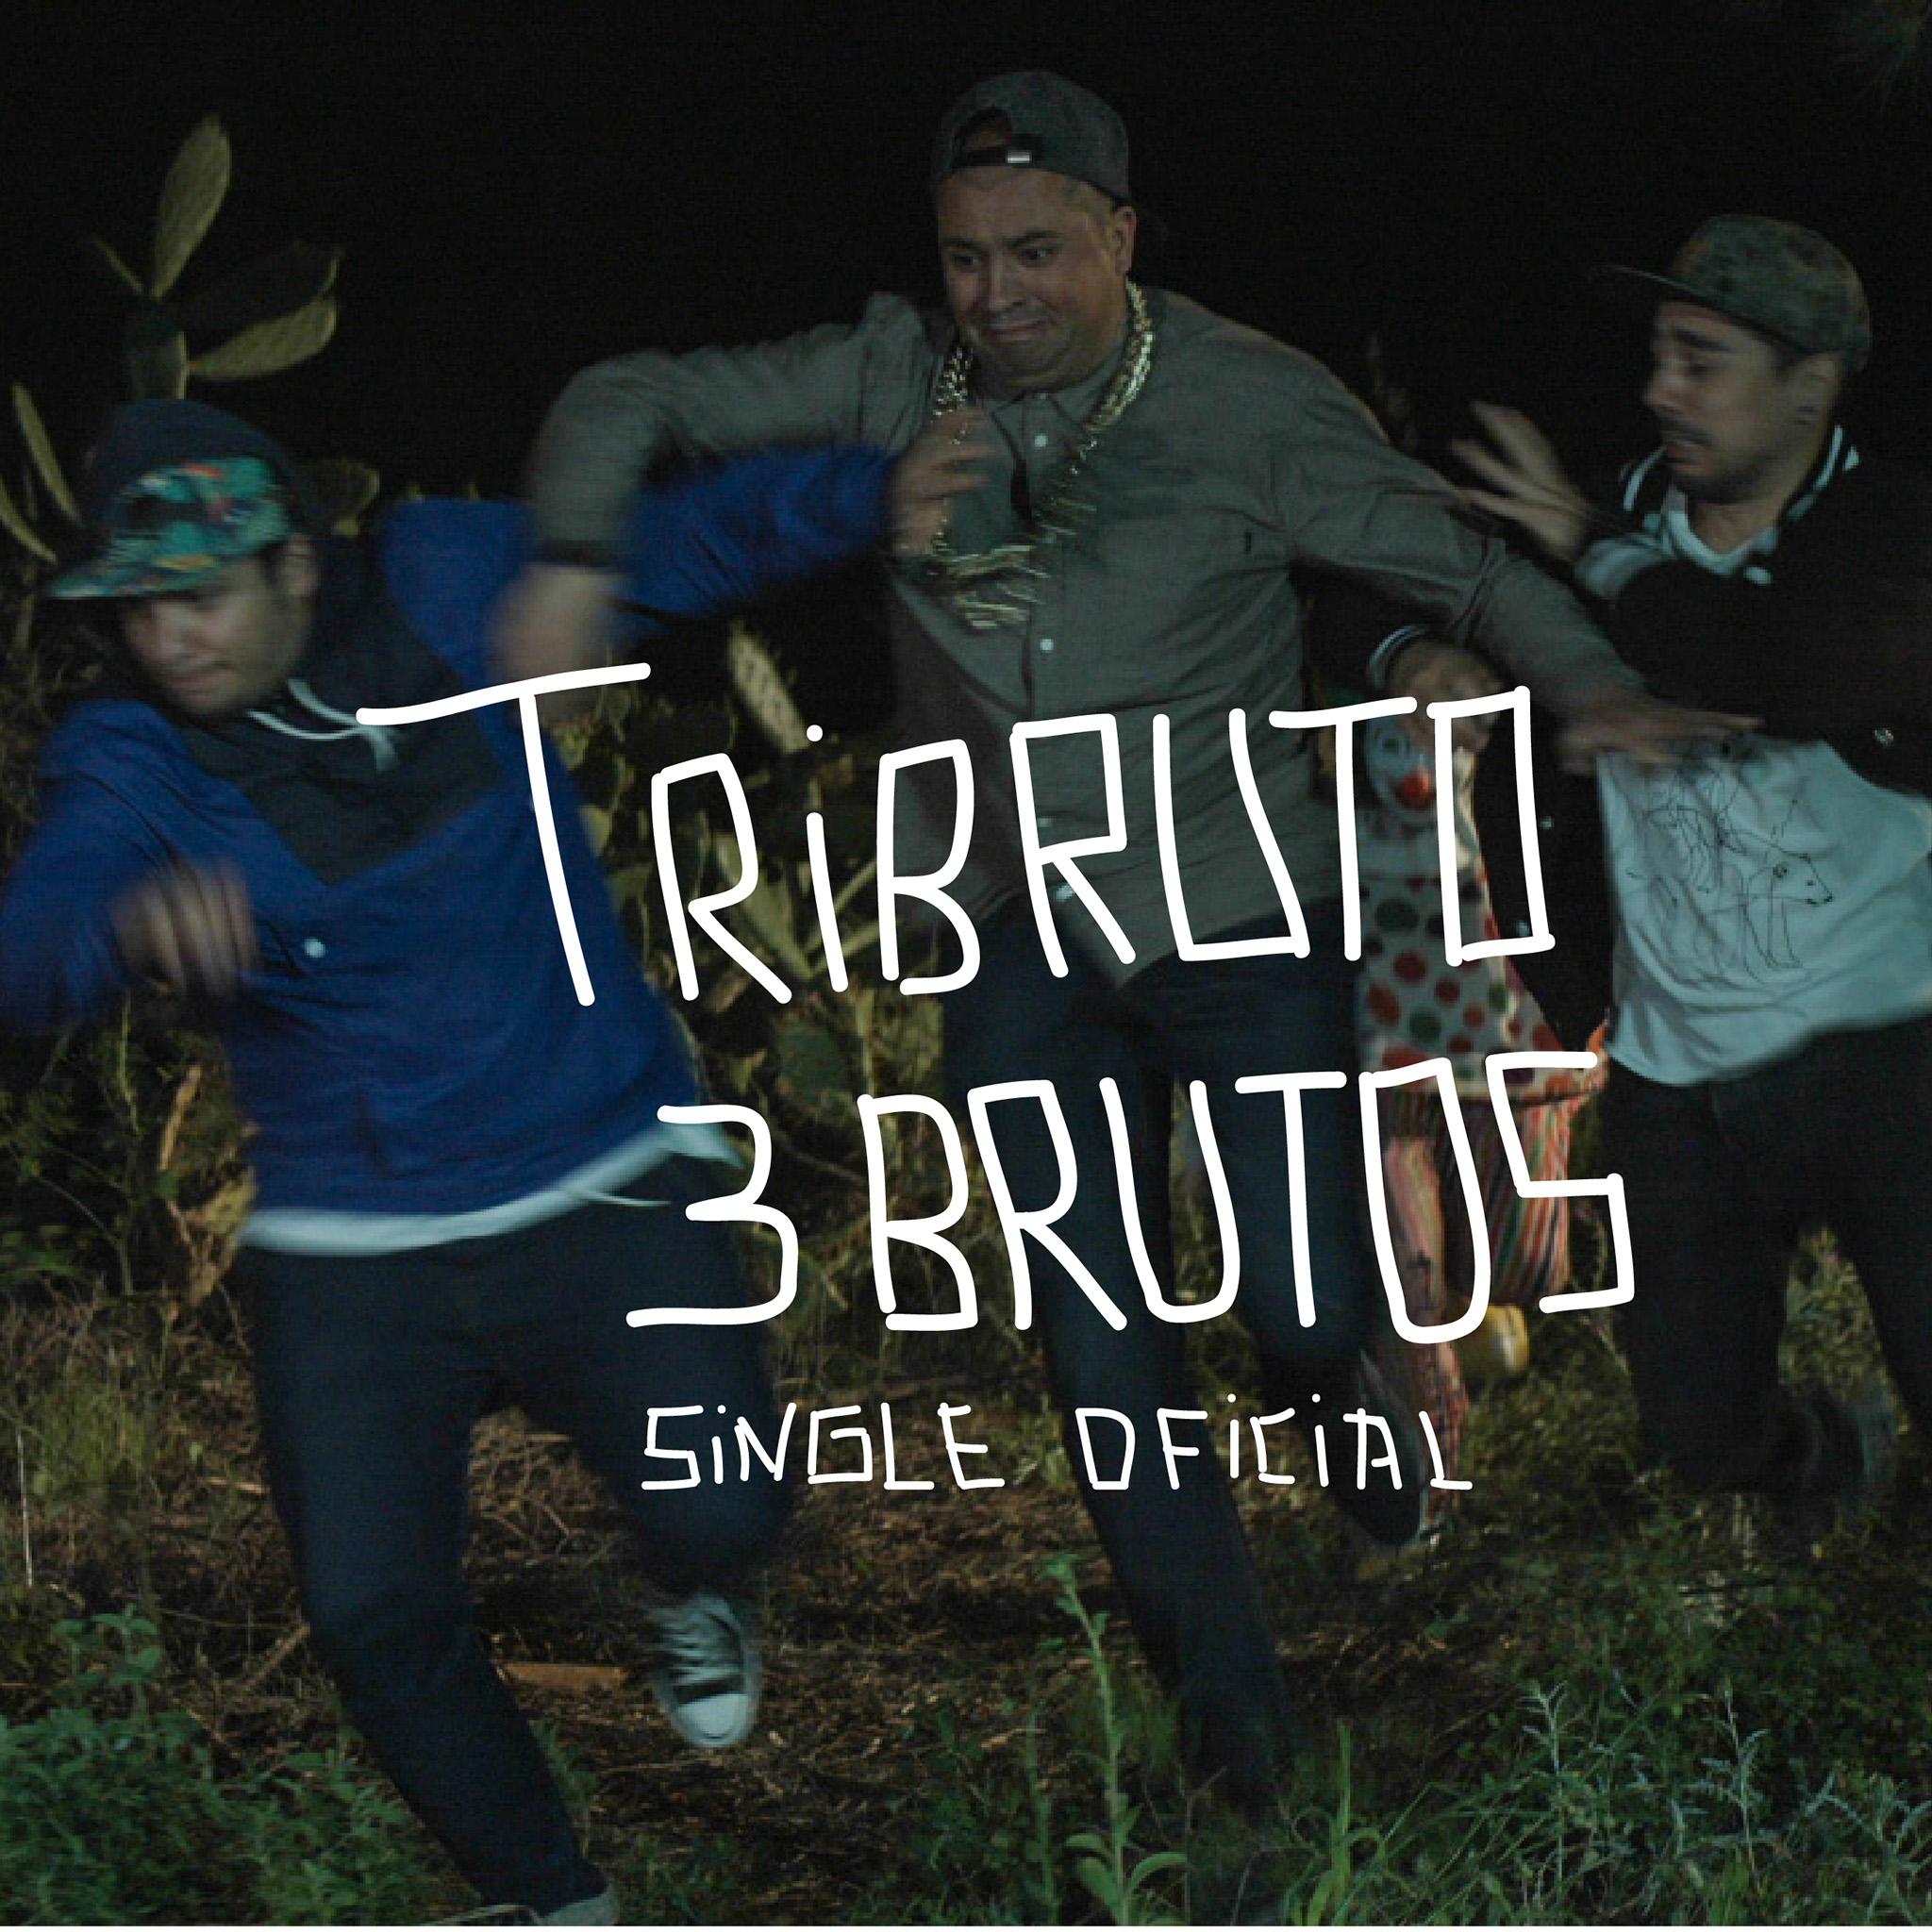 TRIBRUTO - 3 Brutos (Single Oficial)